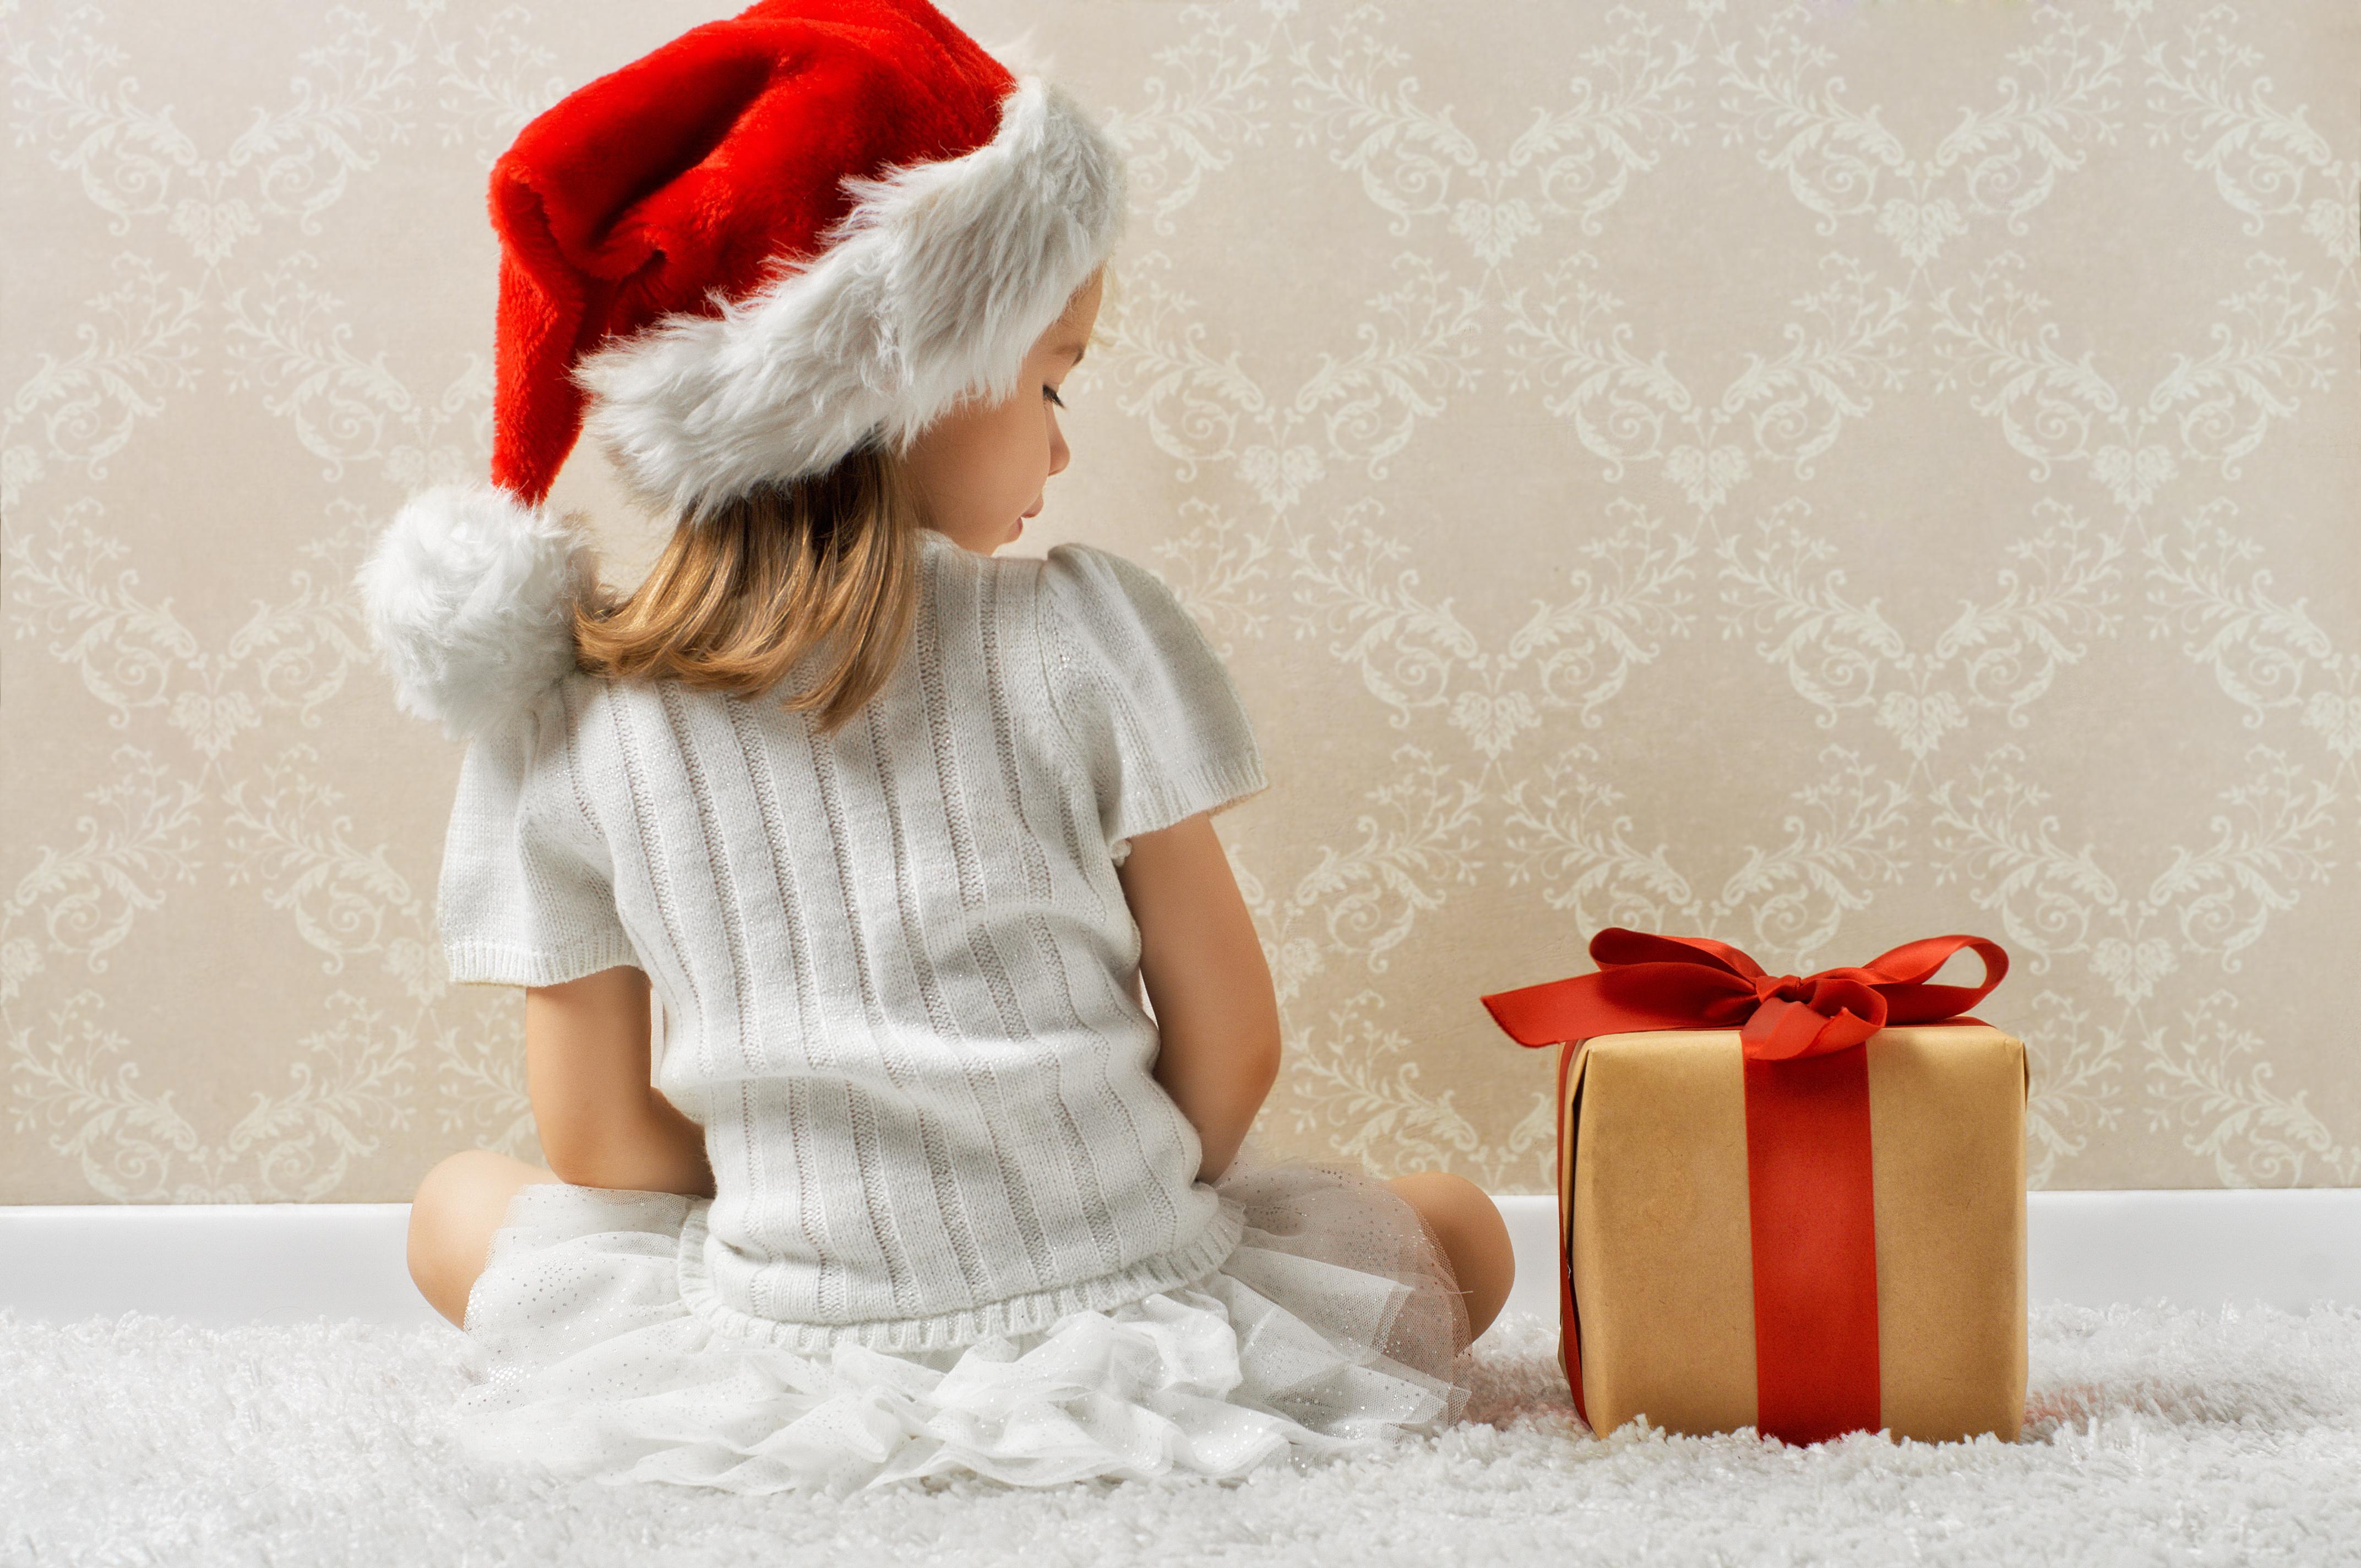 regali sbagliati baby bazar